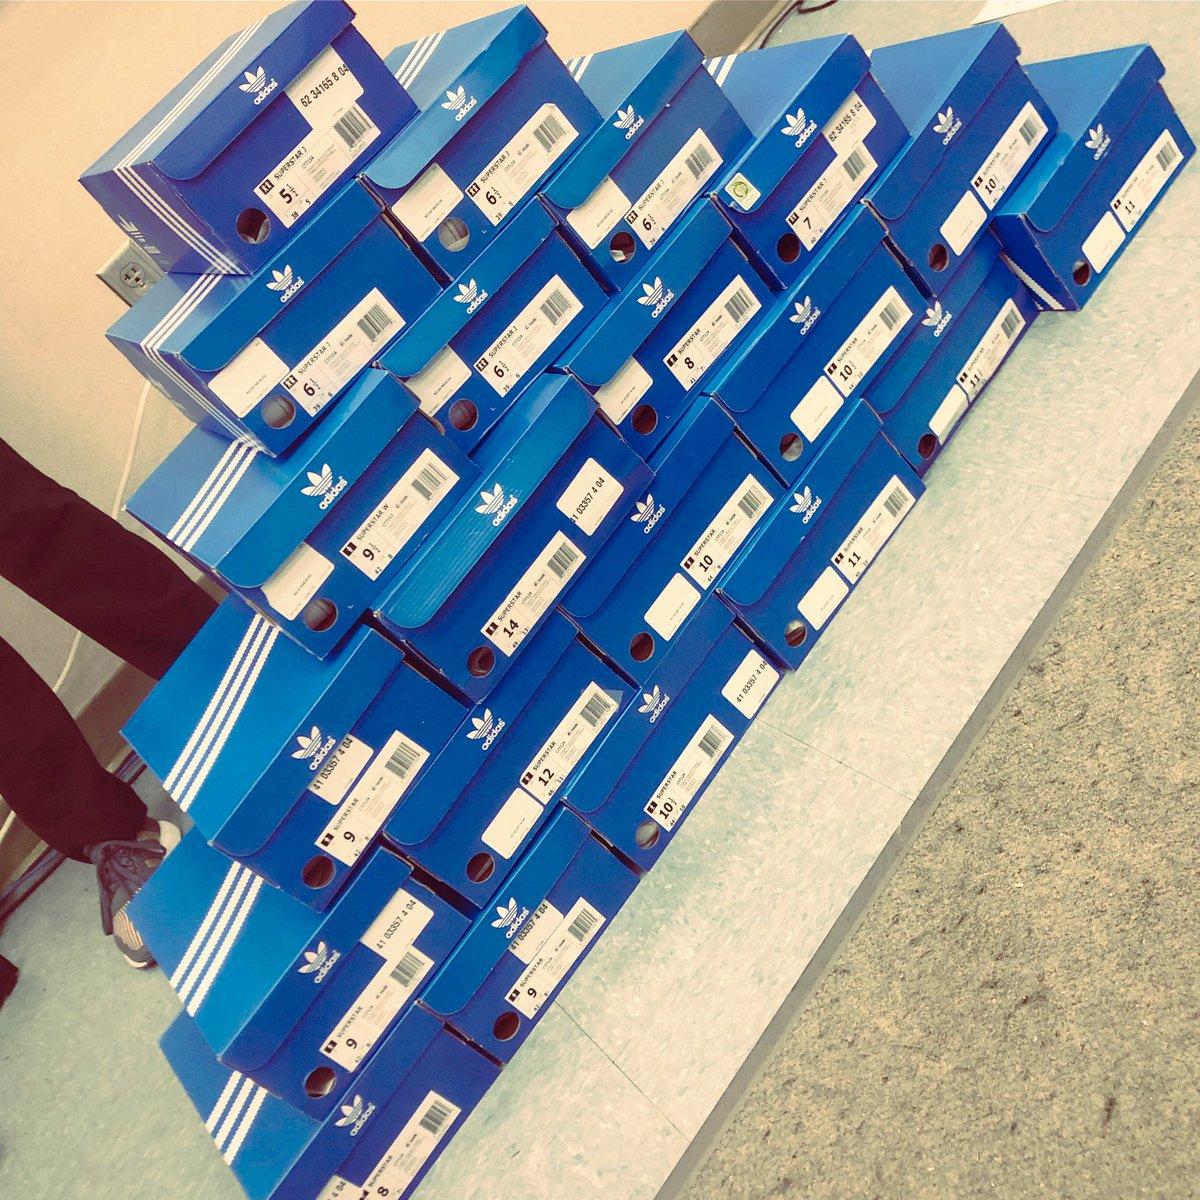 815763a4a7 #adidas #champssports #threestripeslifepic.twitter.com/2KuZwvhOhp